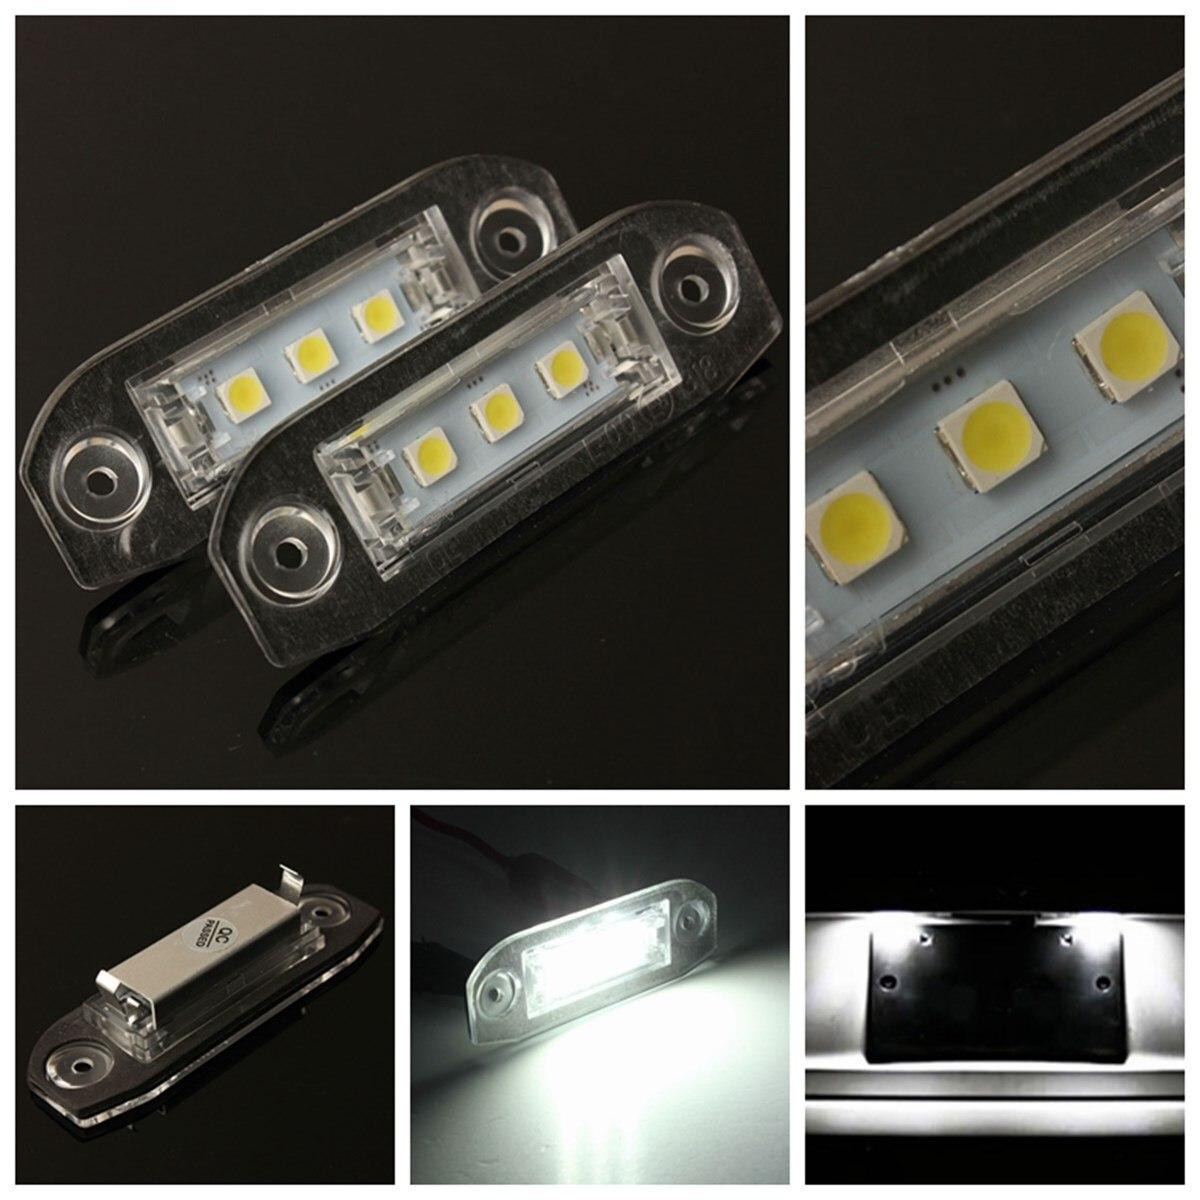 Audew  2x 3LED White Number License Plate Light Lamp For Volvo S80 S60 C70 V70 E-marked<br><br>Aliexpress